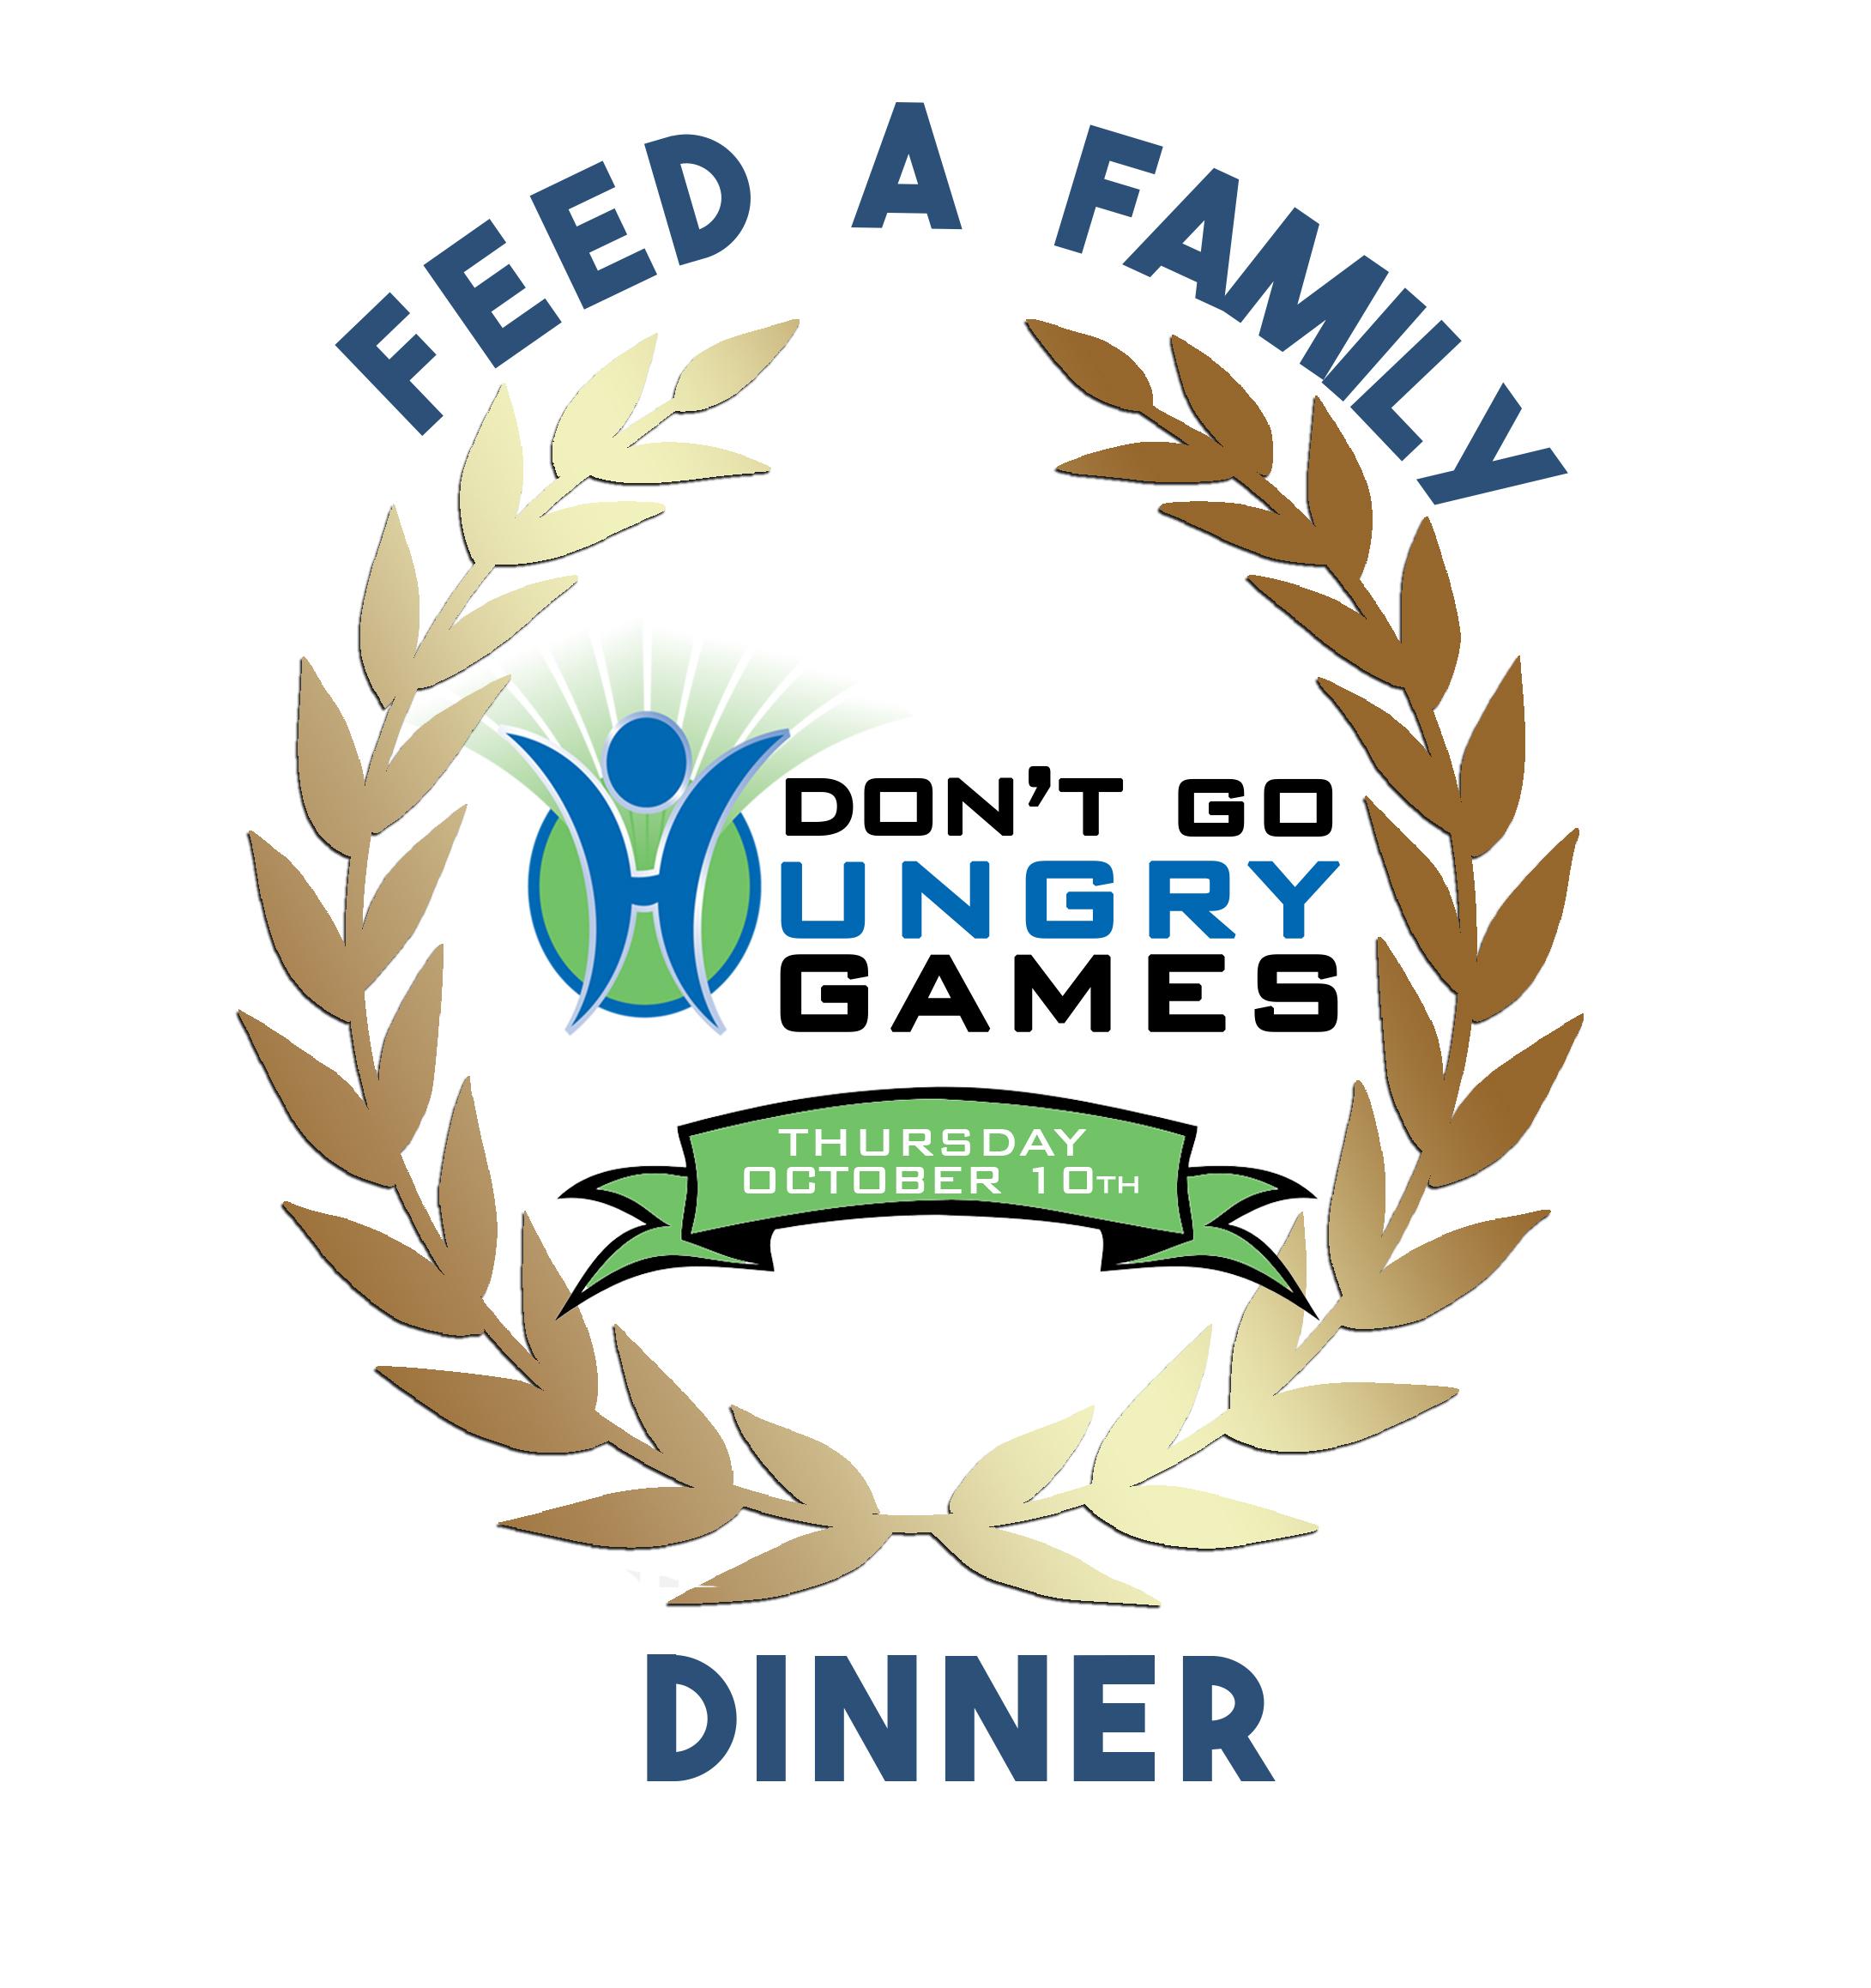 Feed a Family Dinner Fundraiser